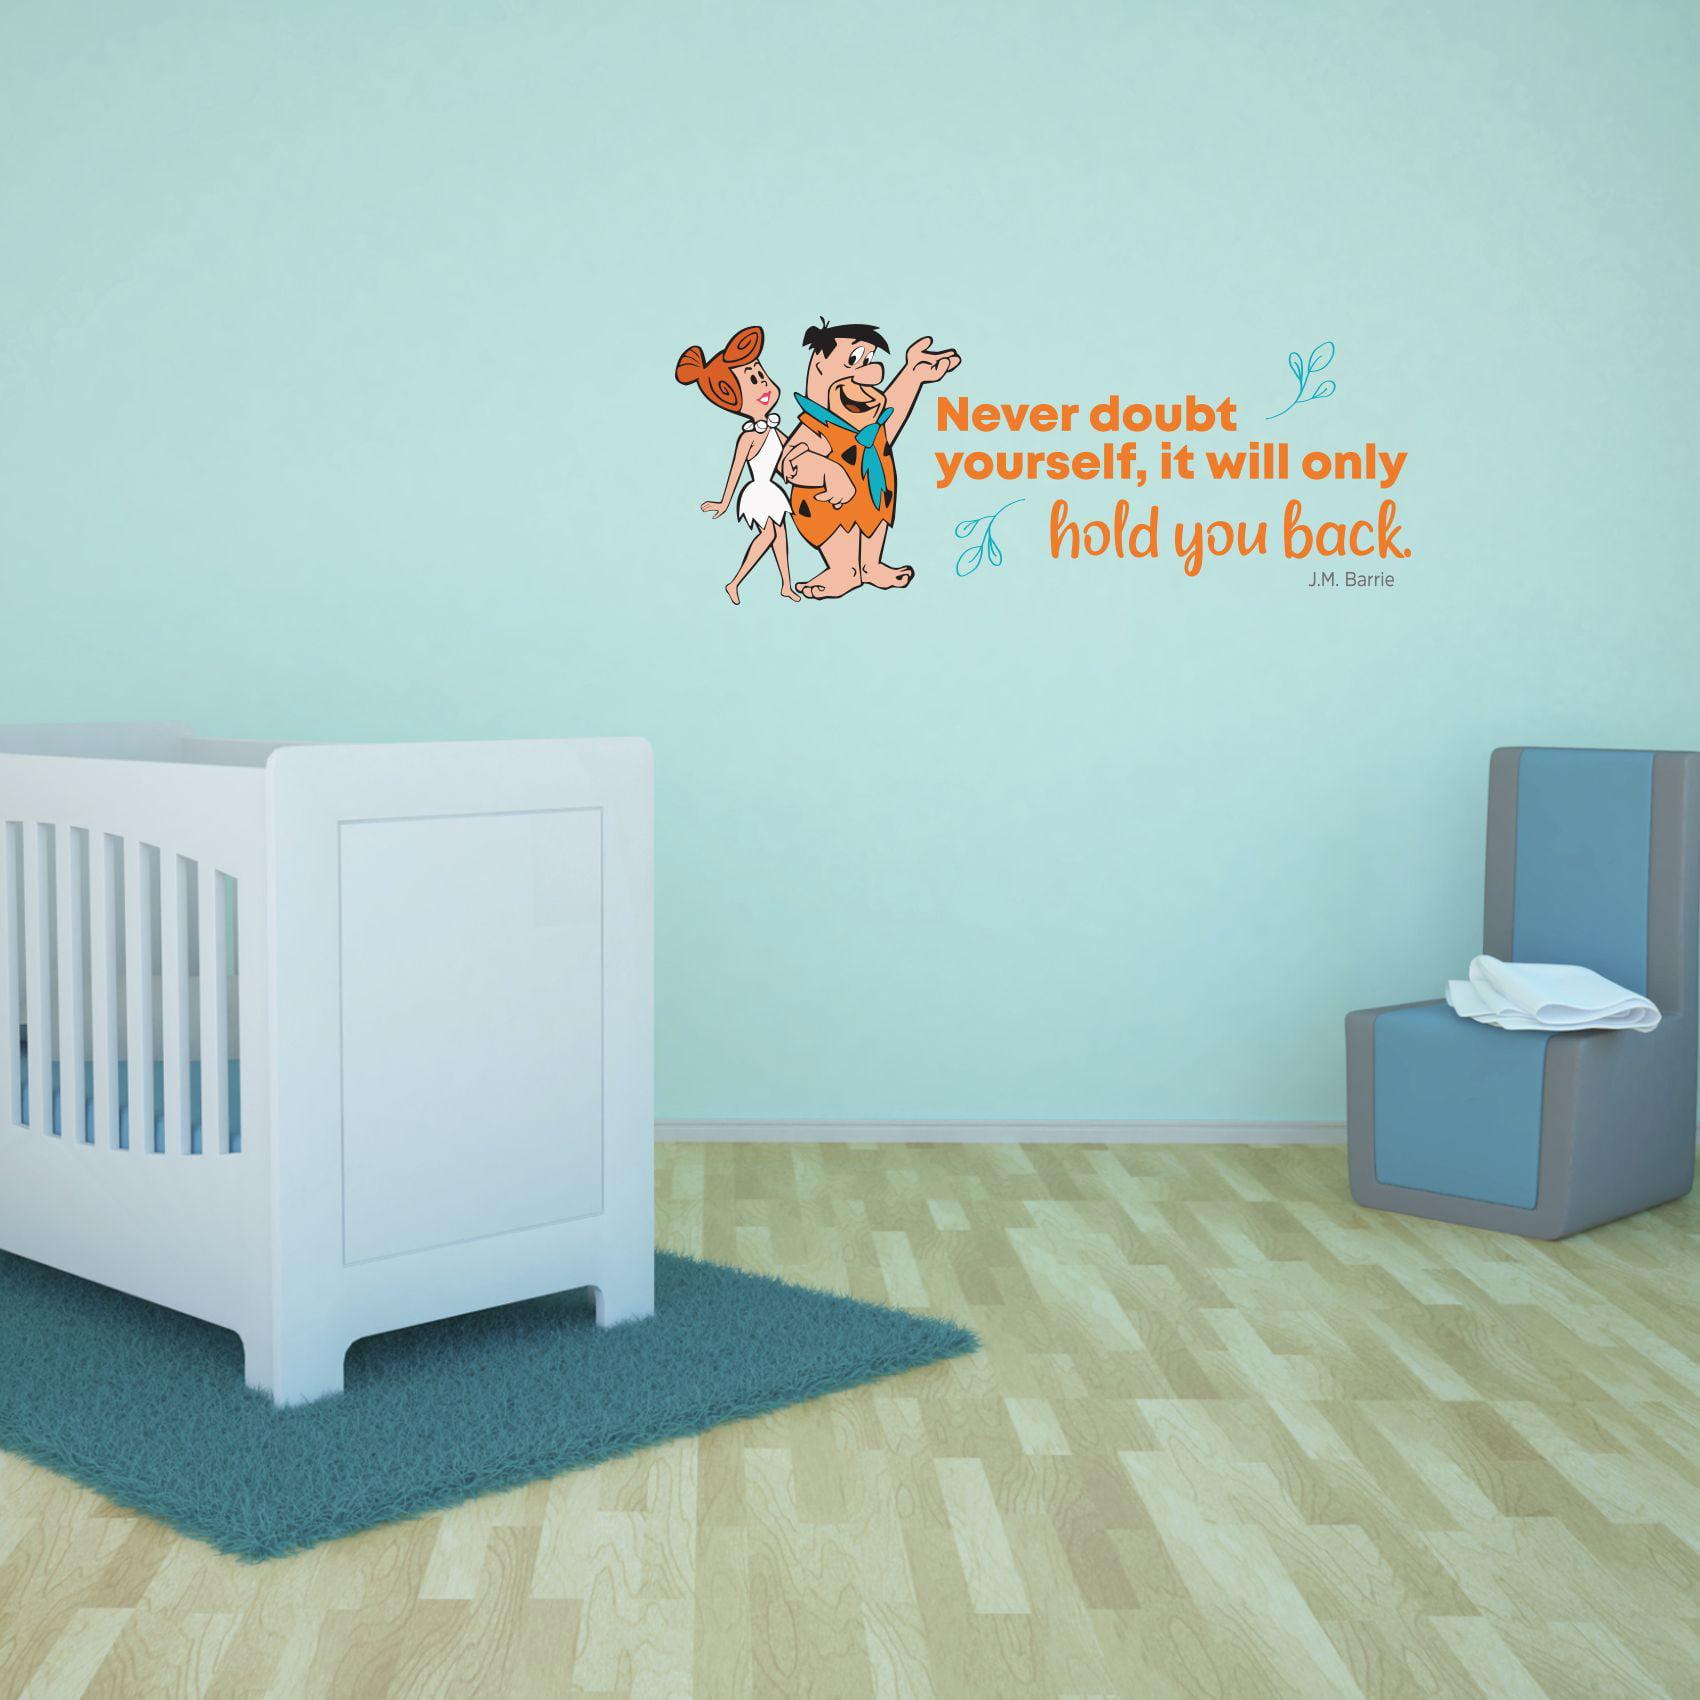 Never Doubt Flintstones Life Quote Cartoon Quotes Decors Wall Sticker Art Design Decal For Girls Boys Kids Room Bedroom Nursery Kindergarten Home Decor Stickers Wall Art Vinyl Decoration 12x20 Inch Walmart Com